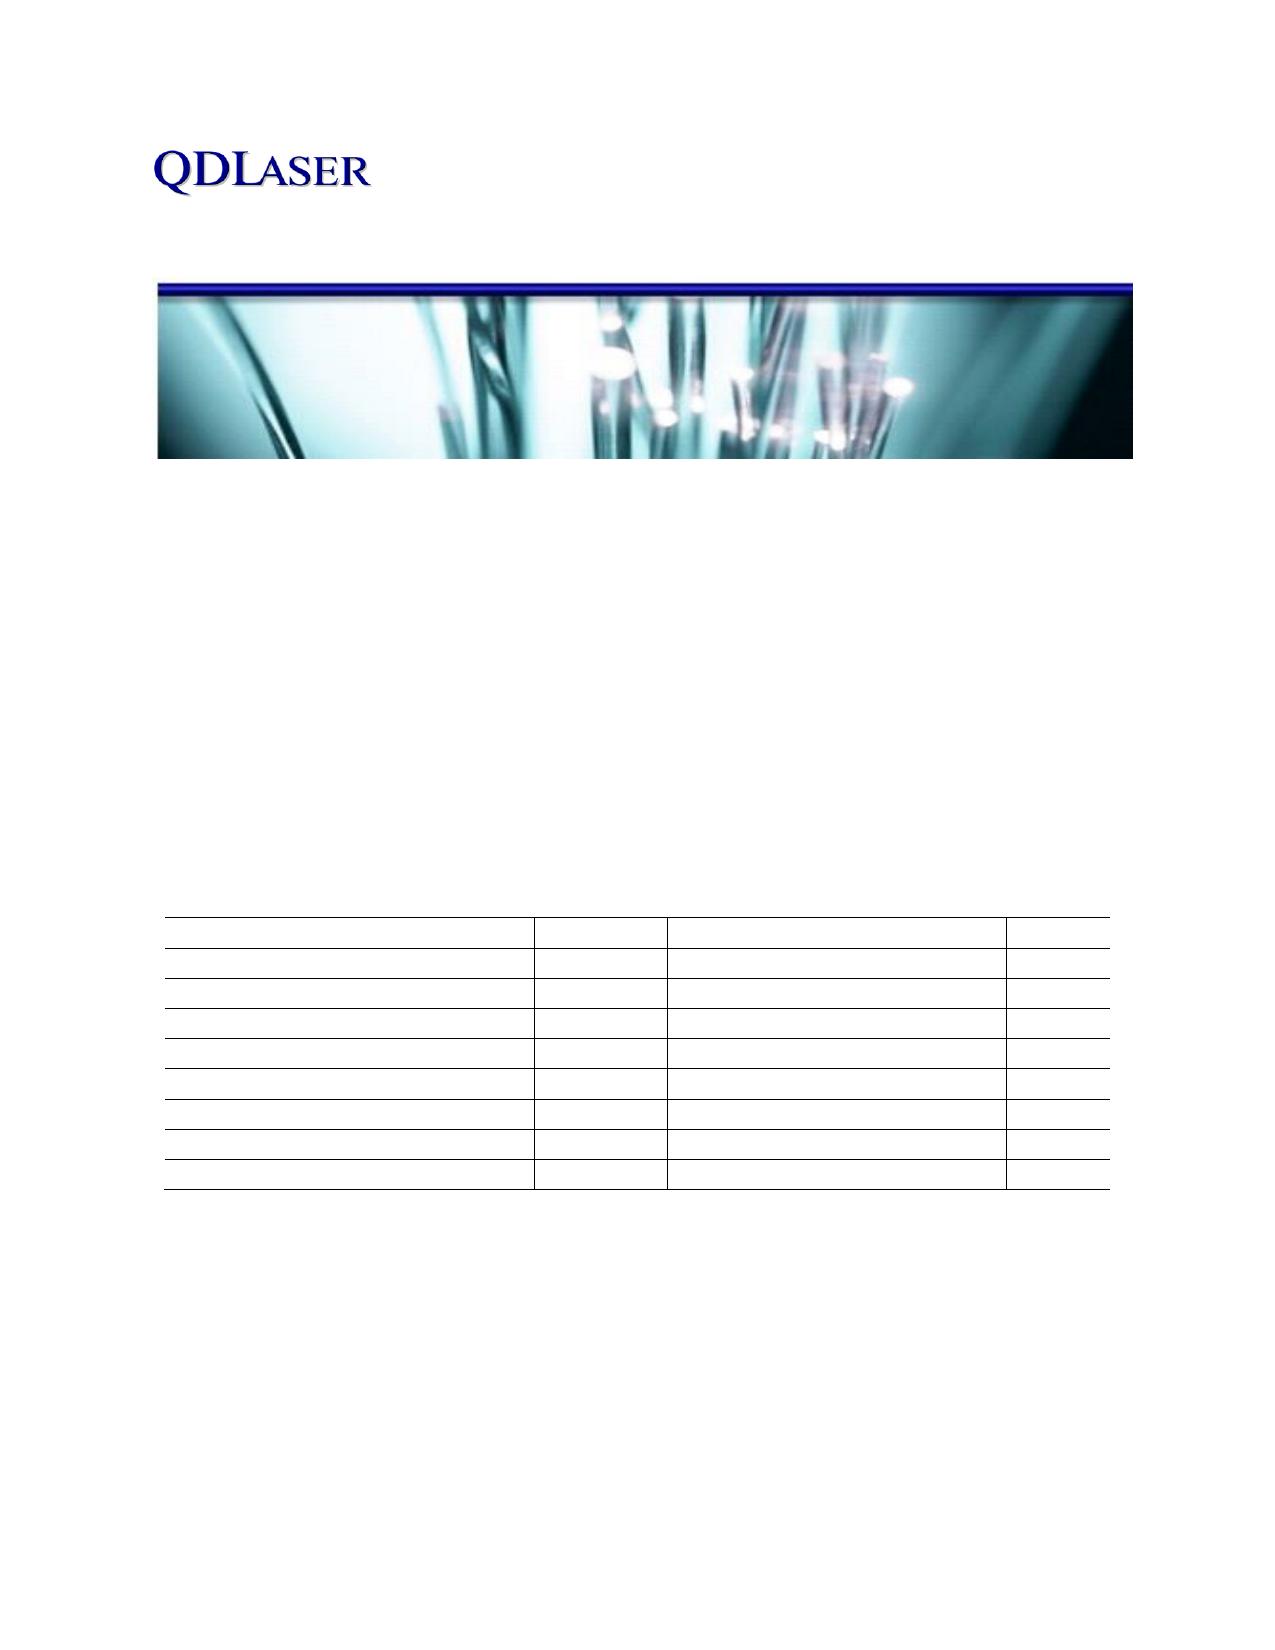 QLD1061-7030 datasheet